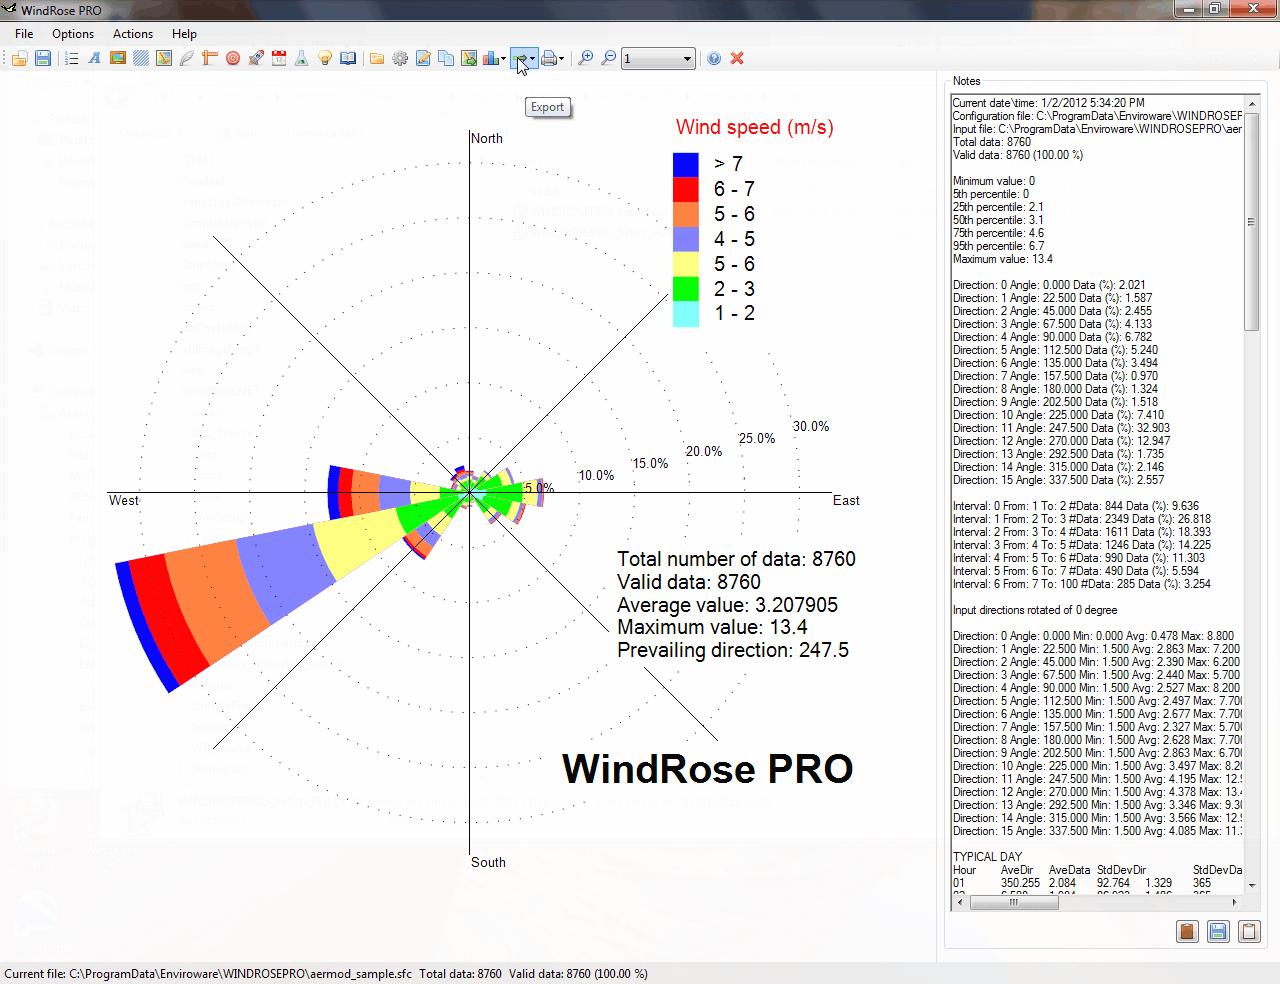 WindRose PRO 3.1.117